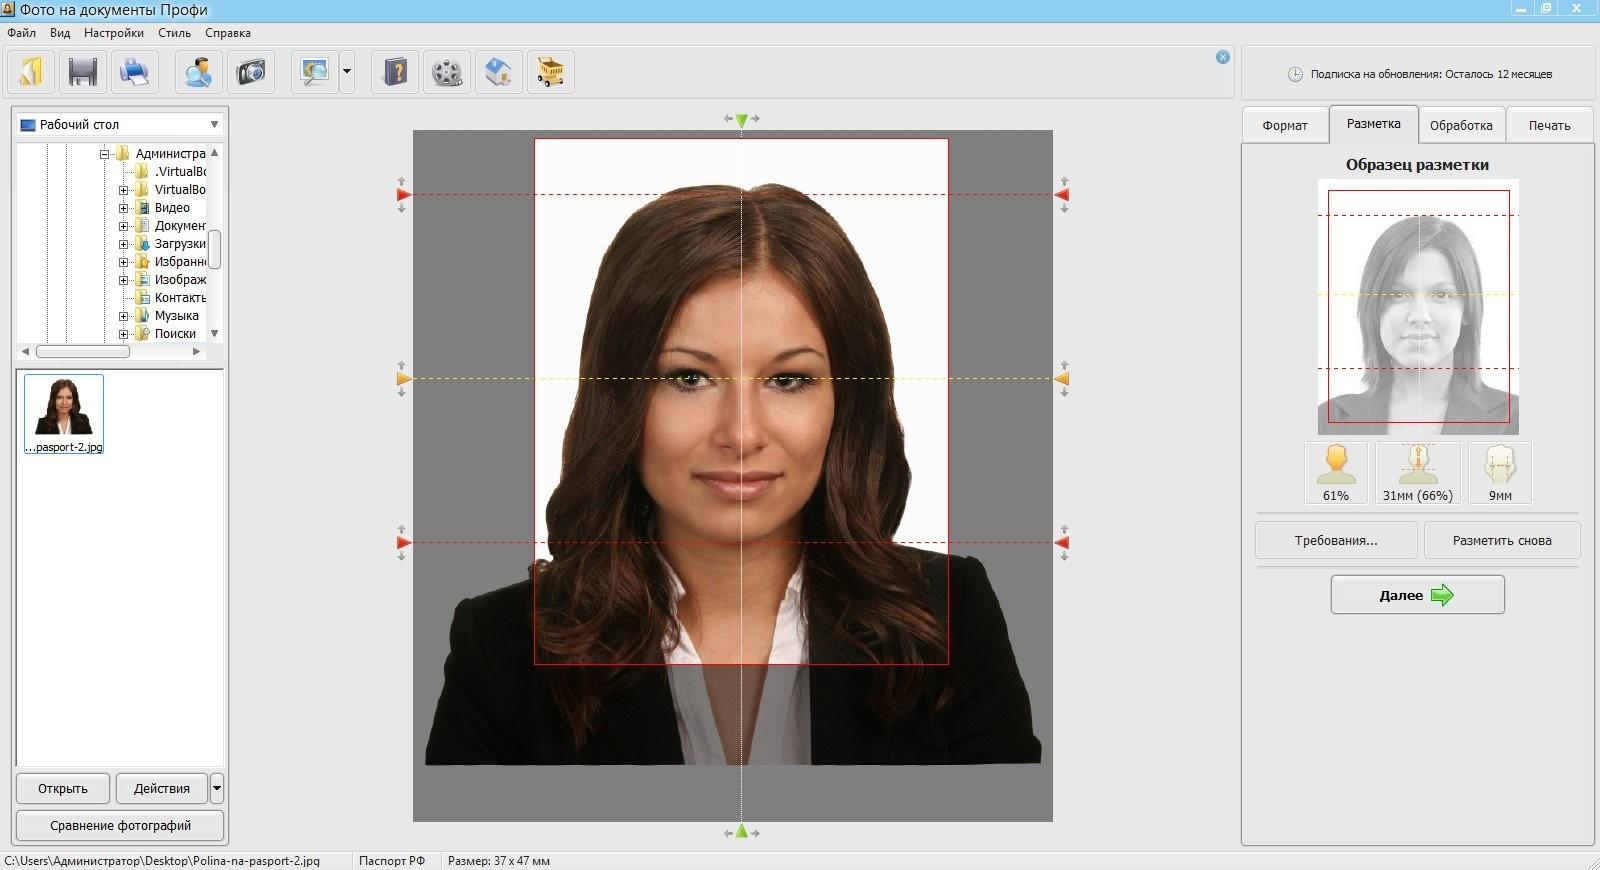 Скачать программу фотодокумент скачать программу для андроид zoiper